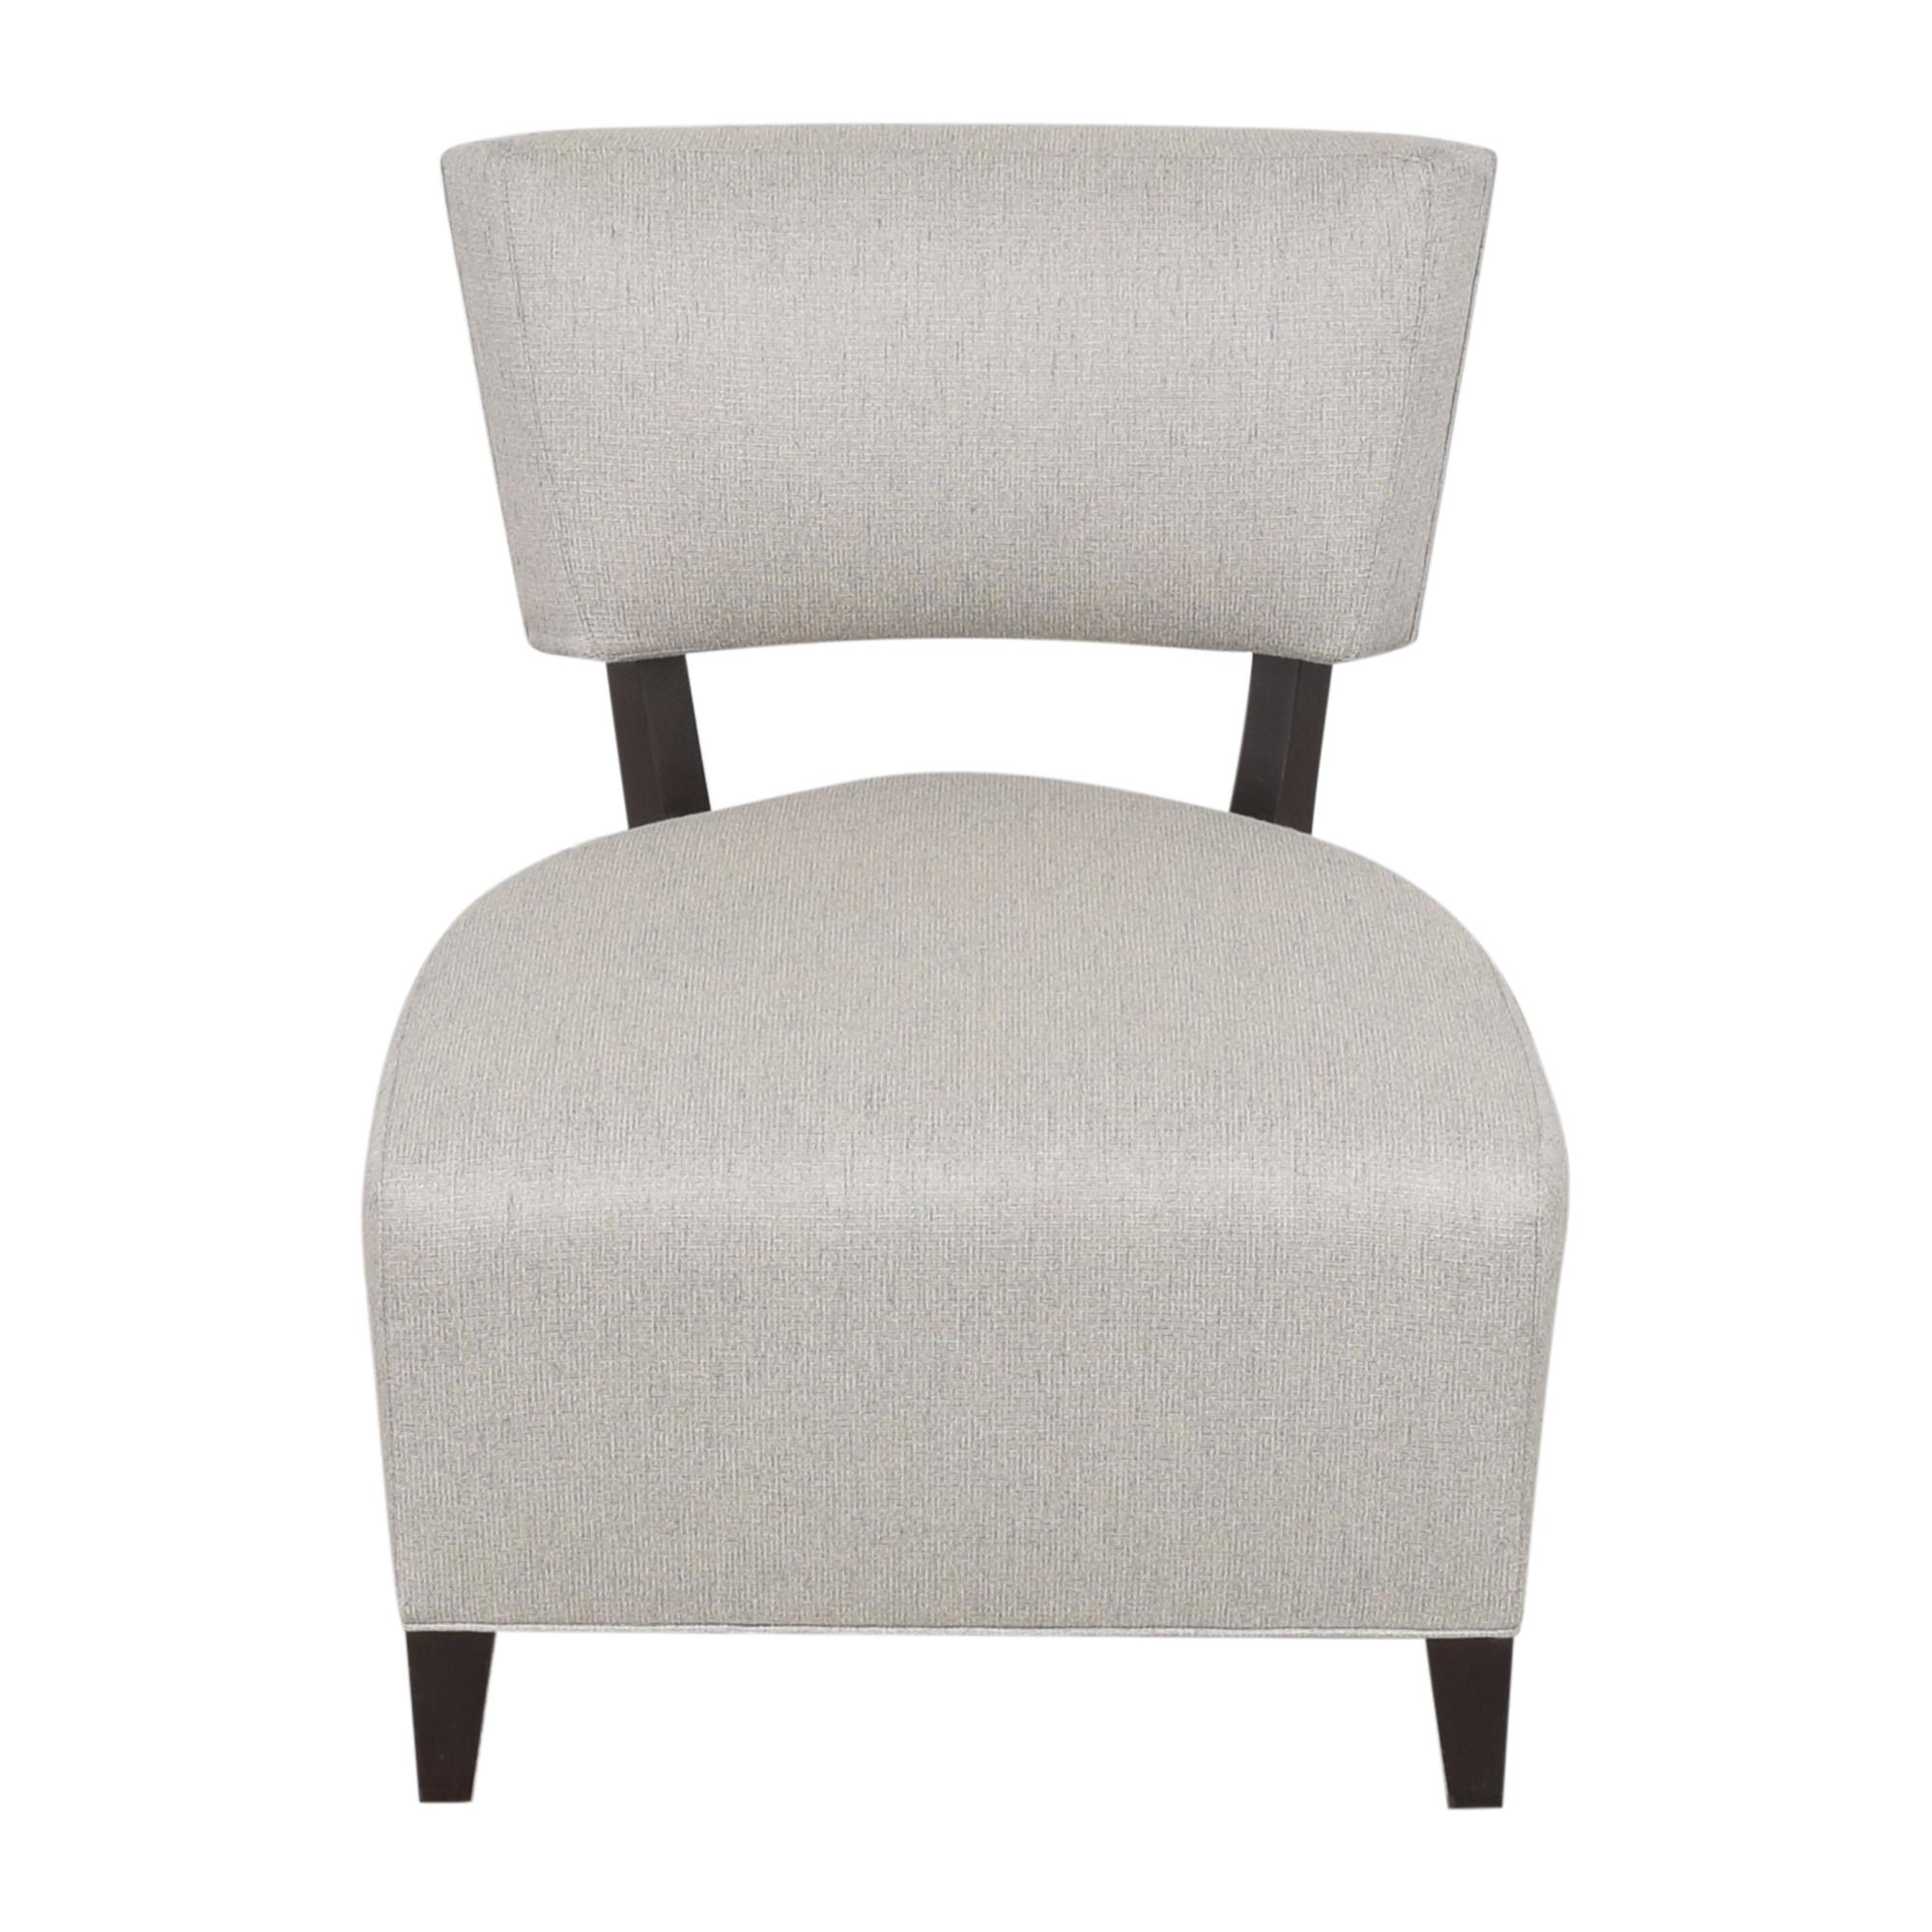 Ethan Allen Ethan Allen Armless Accent Chair on sale